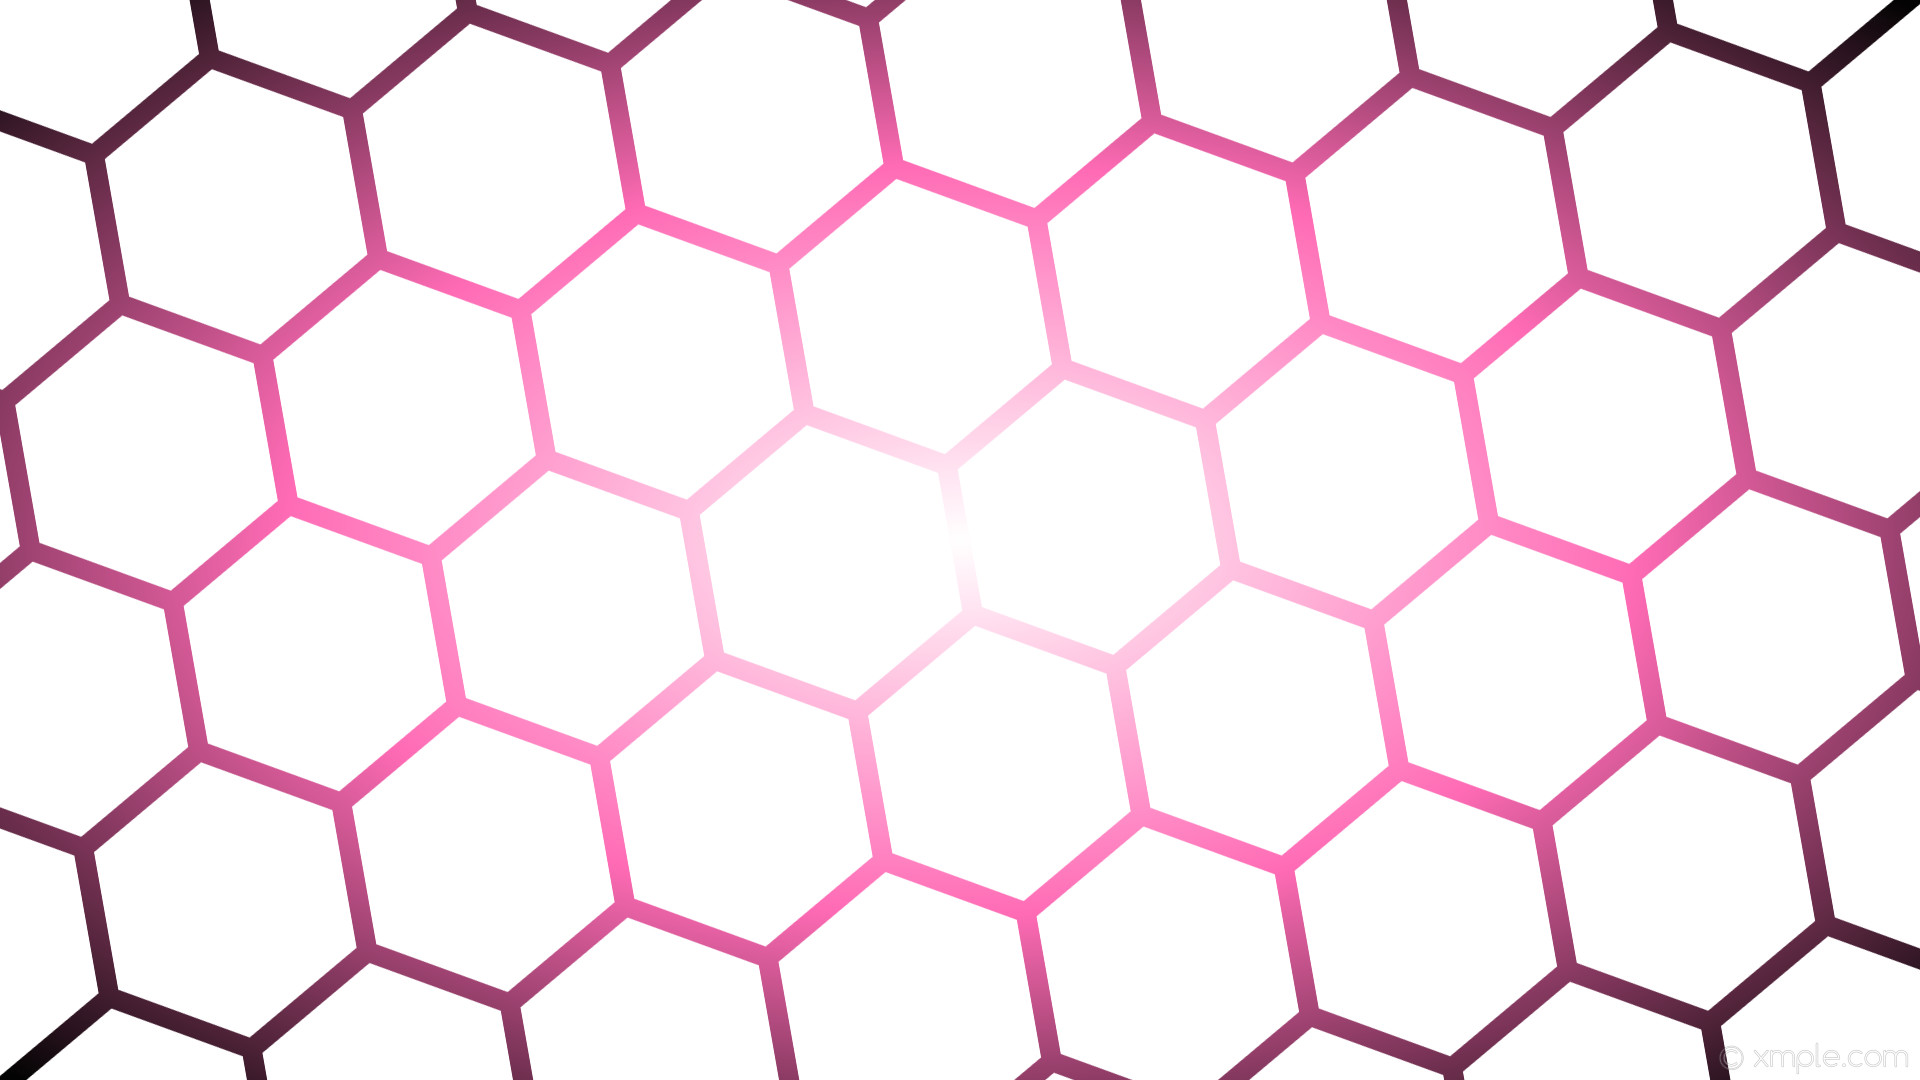 wallpaper glow hexagon white pink black gradient hot pink #ffffff #ffffff  #ff69b4 diagonal